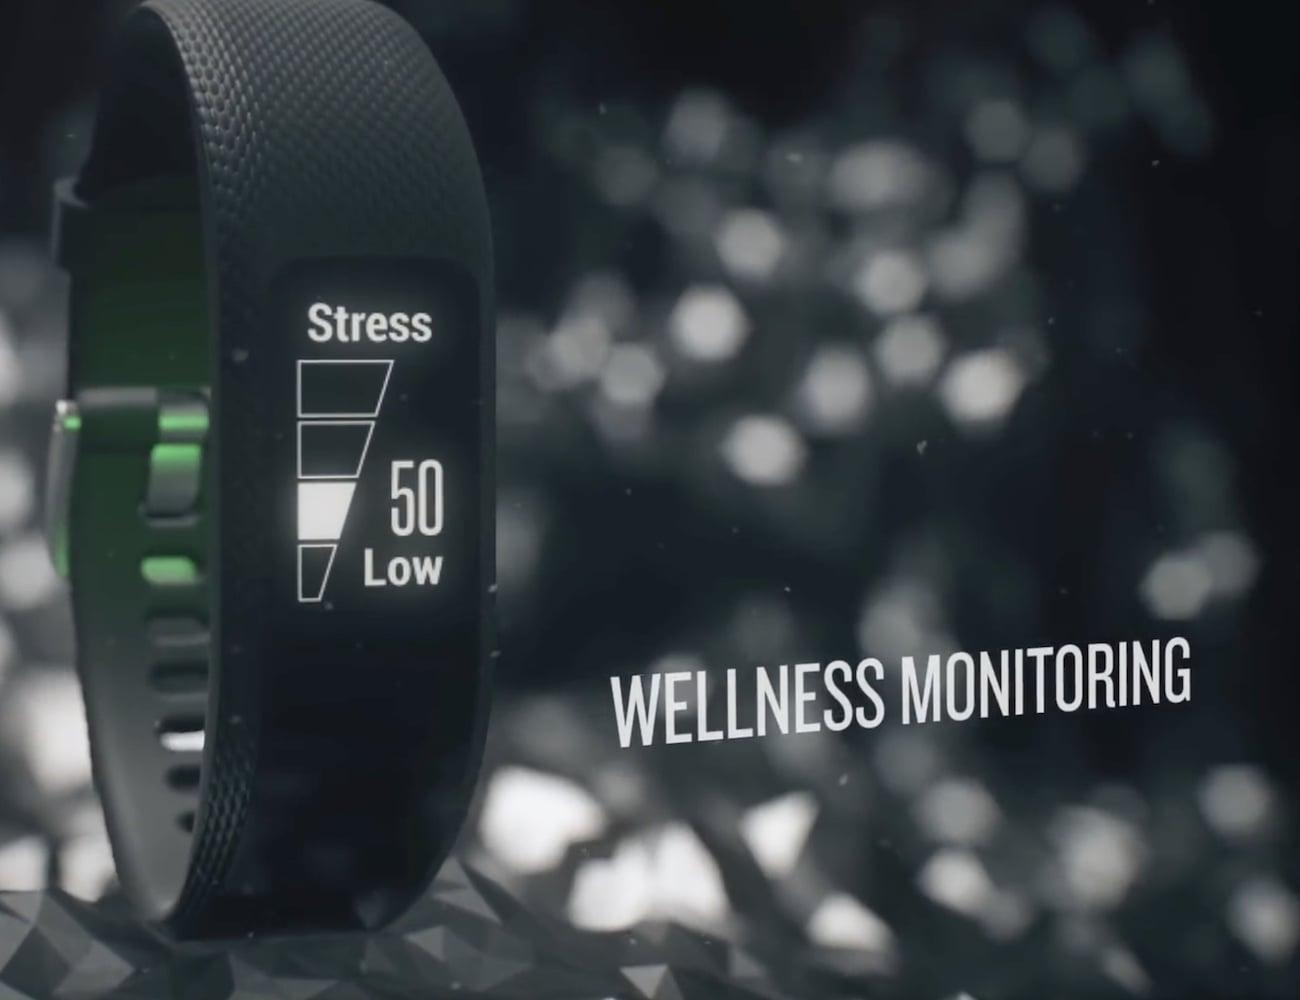 Garmin Vivosmart 3 Smartwatch